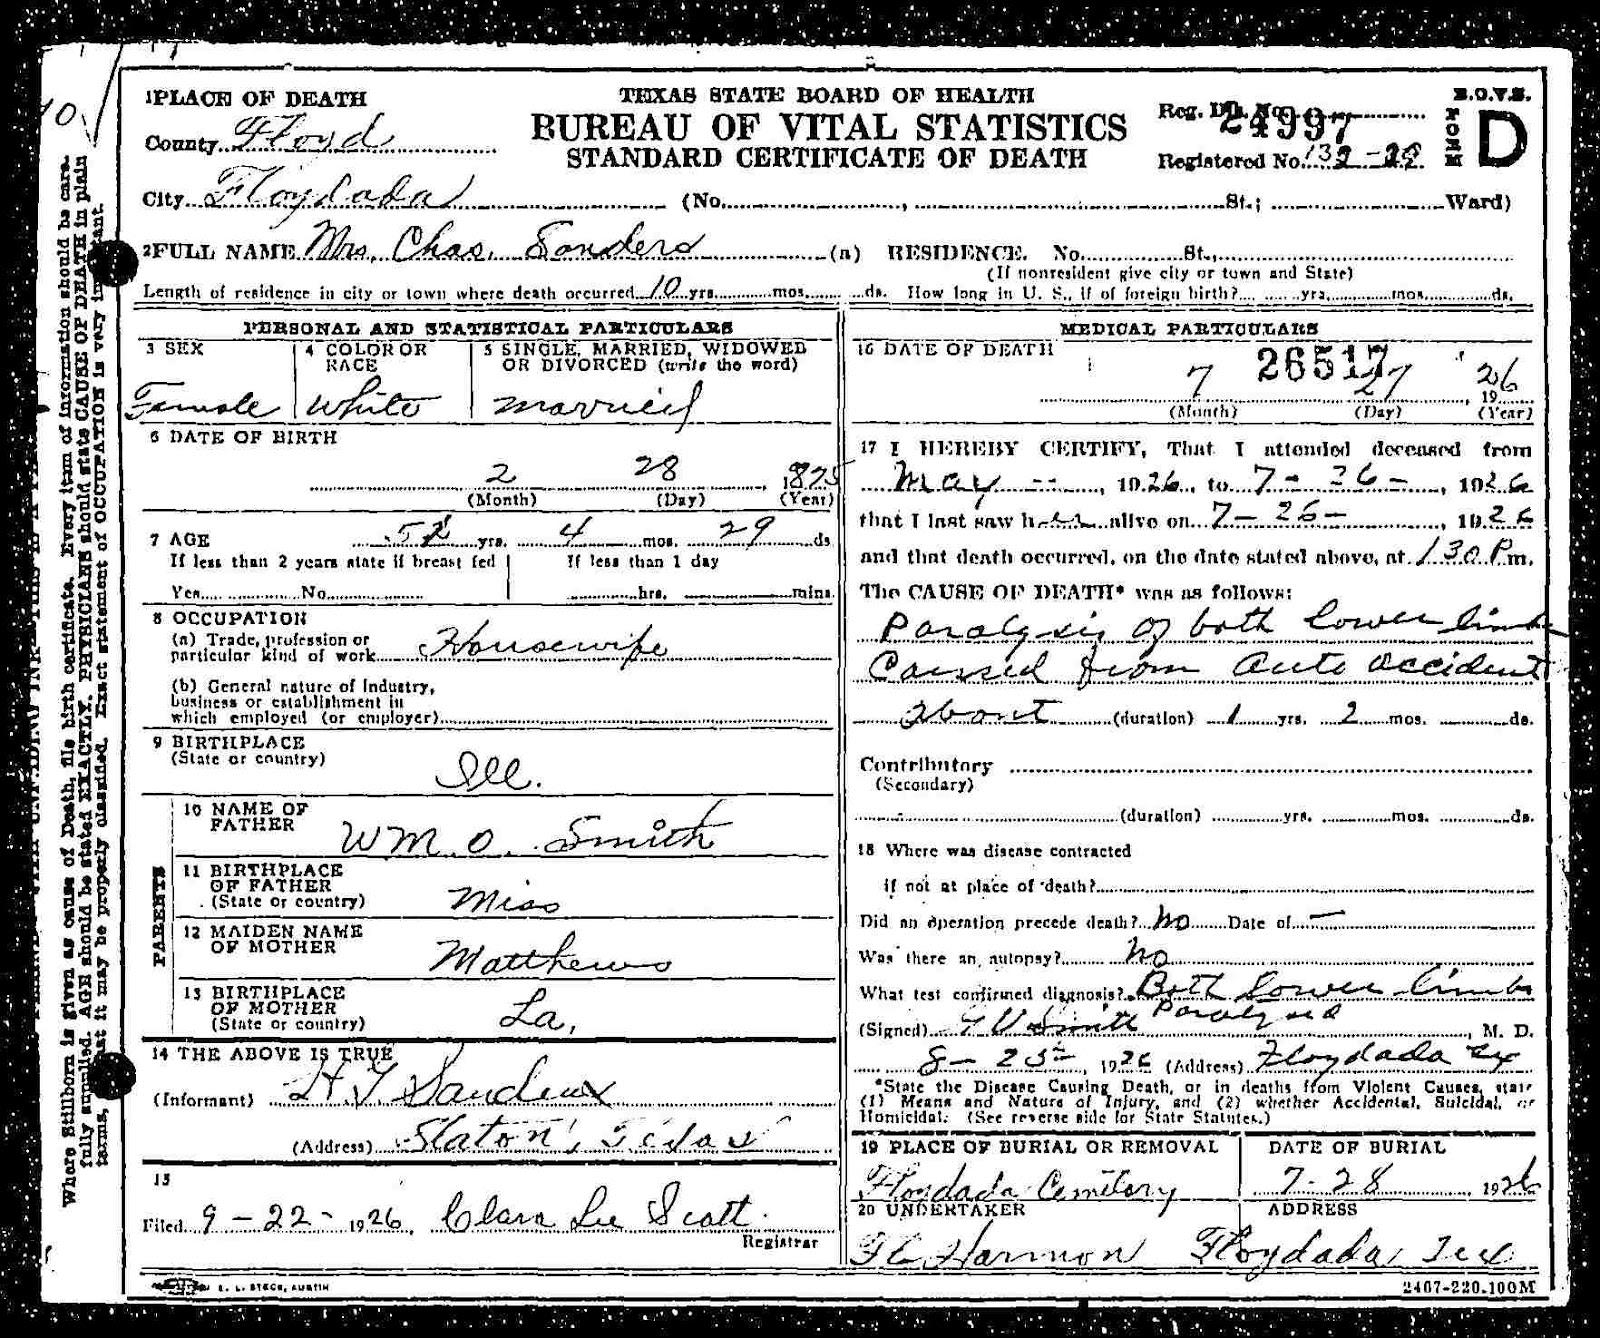 Some lemon family history charles sanders annie madalene smith texas state board of health bureau of vital statistics standard certificate of death aiddatafo Choice Image